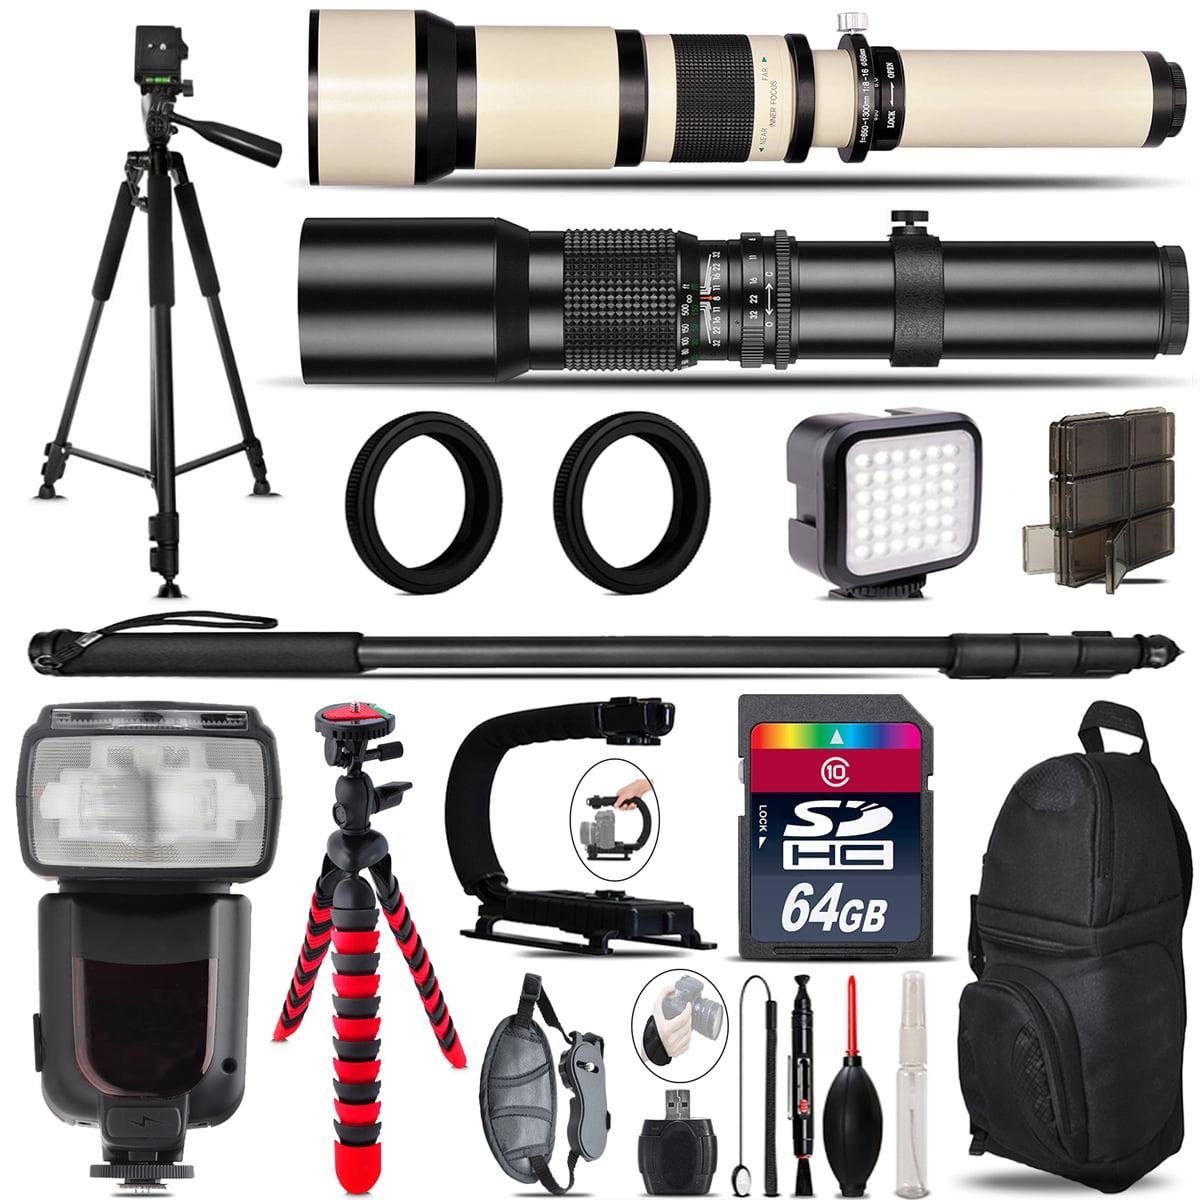 500mm-1300mm Telephoto Lens for Rebel T6 T6i + Pro Flash + LED Light - 64GB Kit